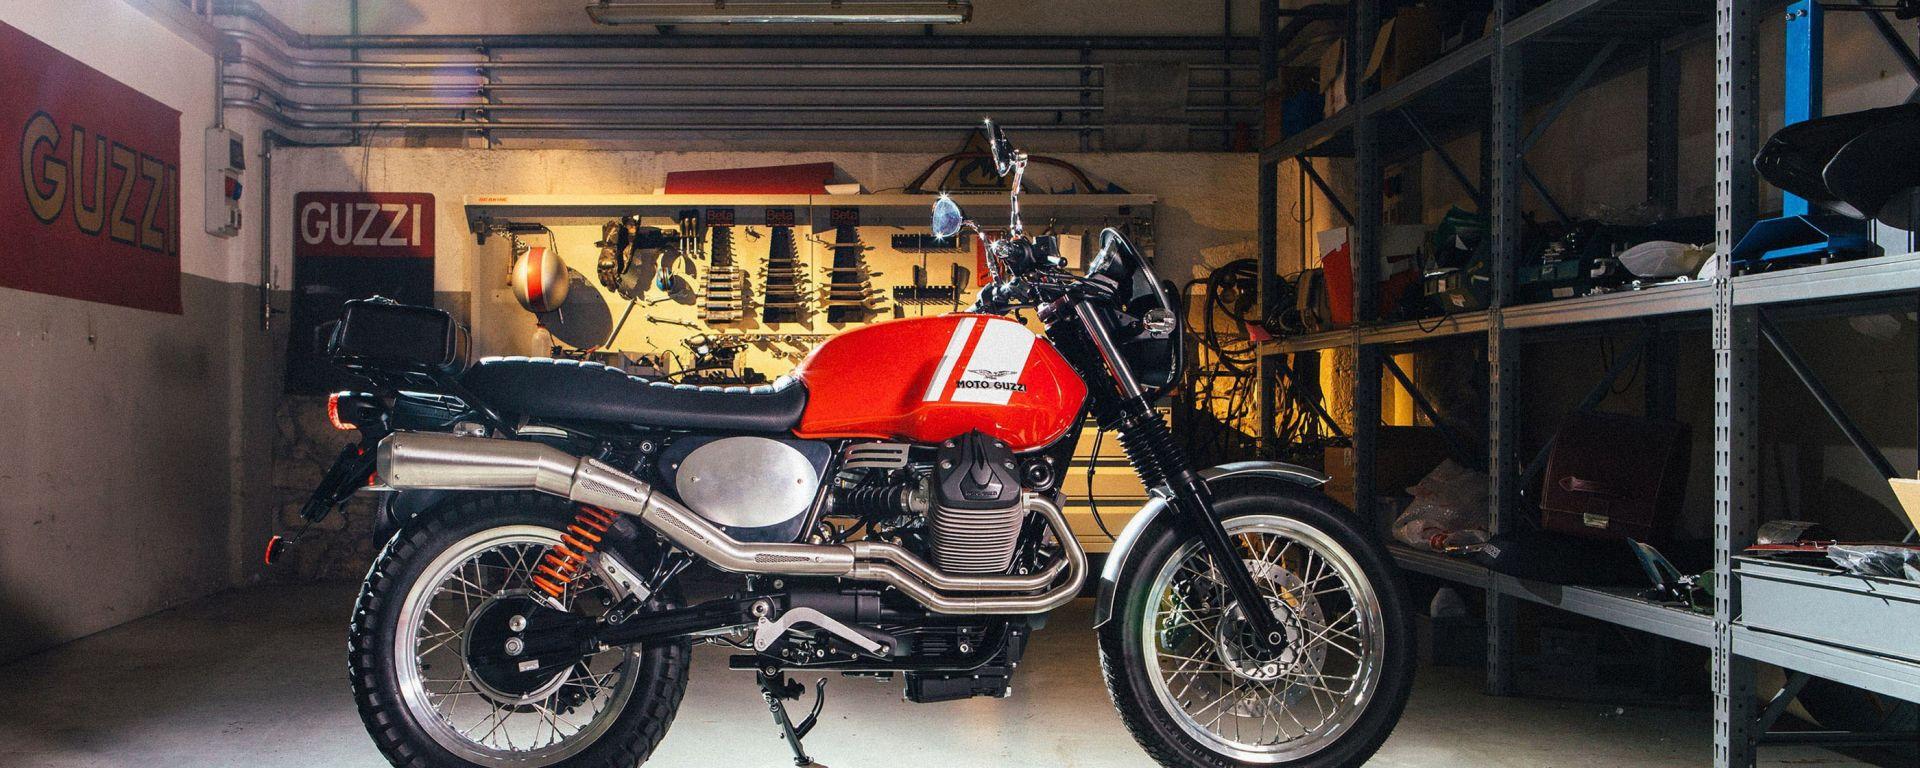 Moto Guzzi al Motor Bike Expo